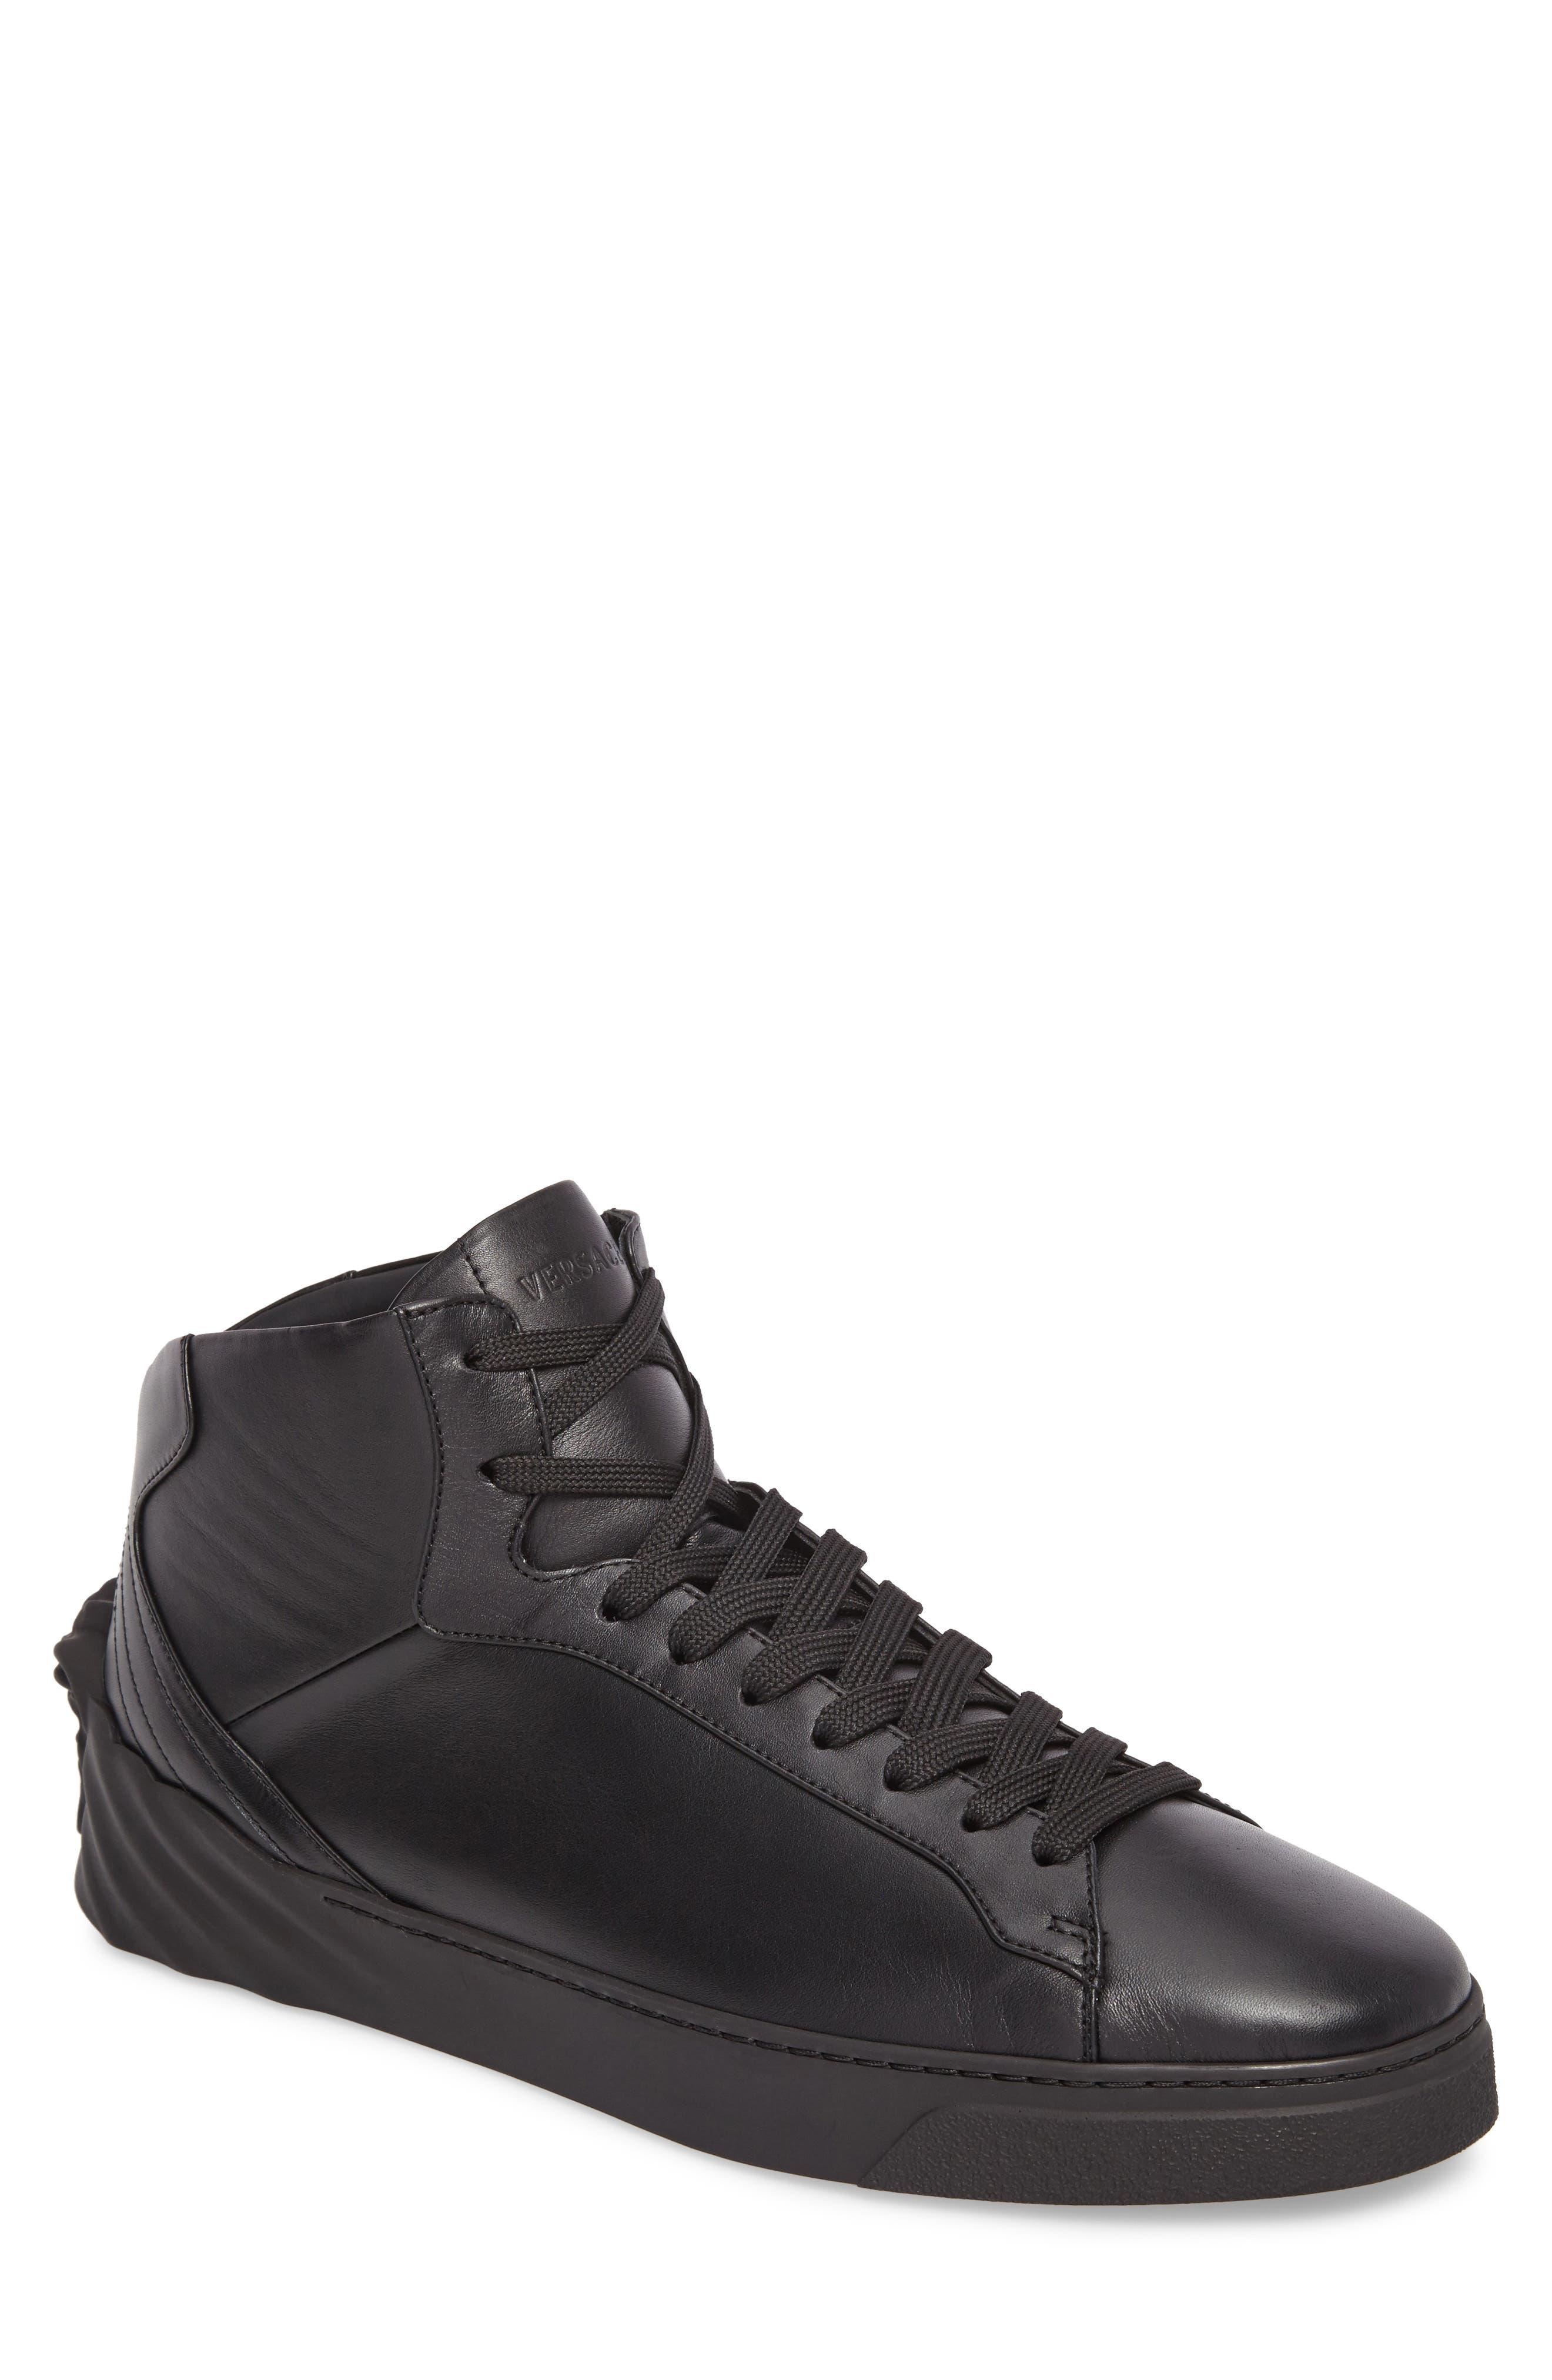 3D Medusa Sneaker,                             Main thumbnail 1, color,                             008